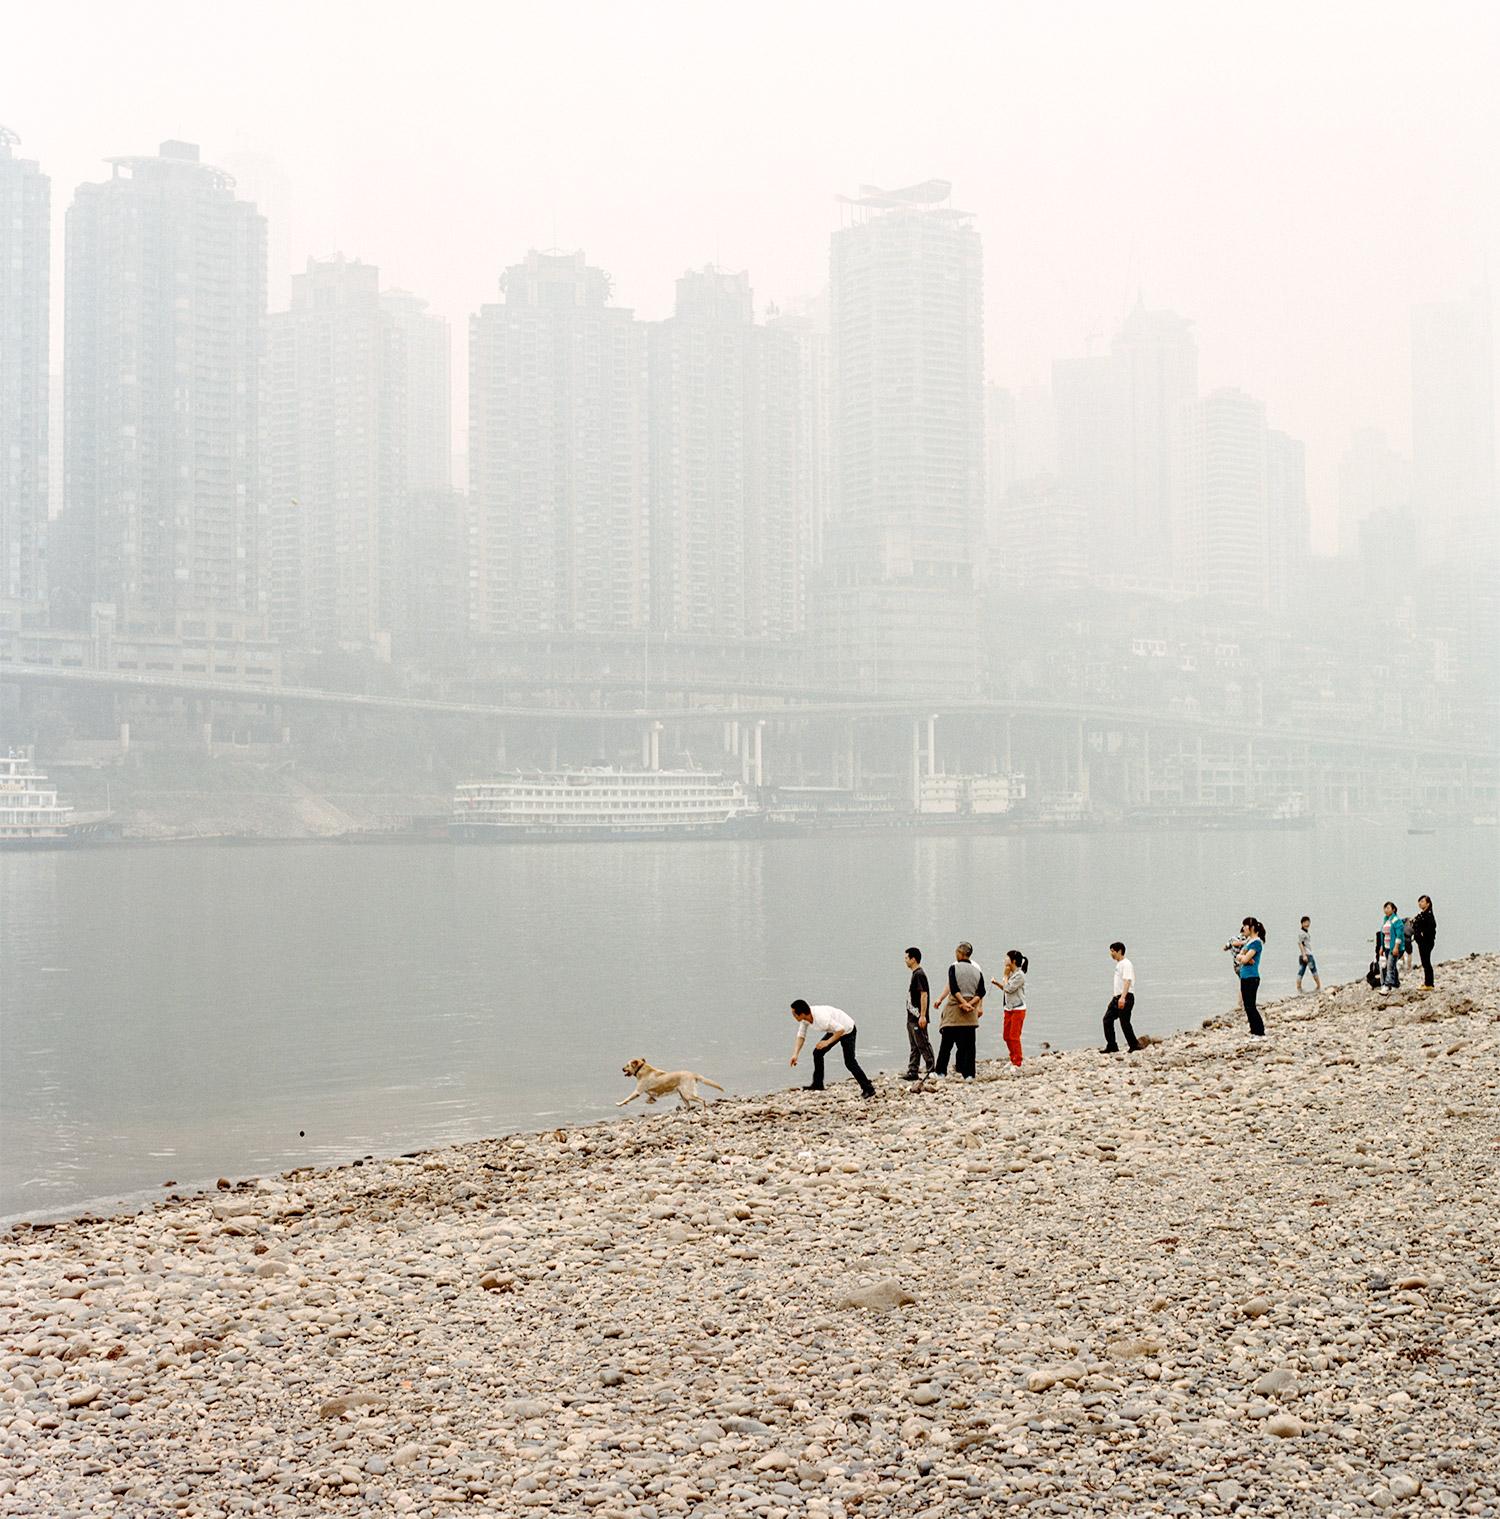 chongqing_TimFranco-004-3.jpg